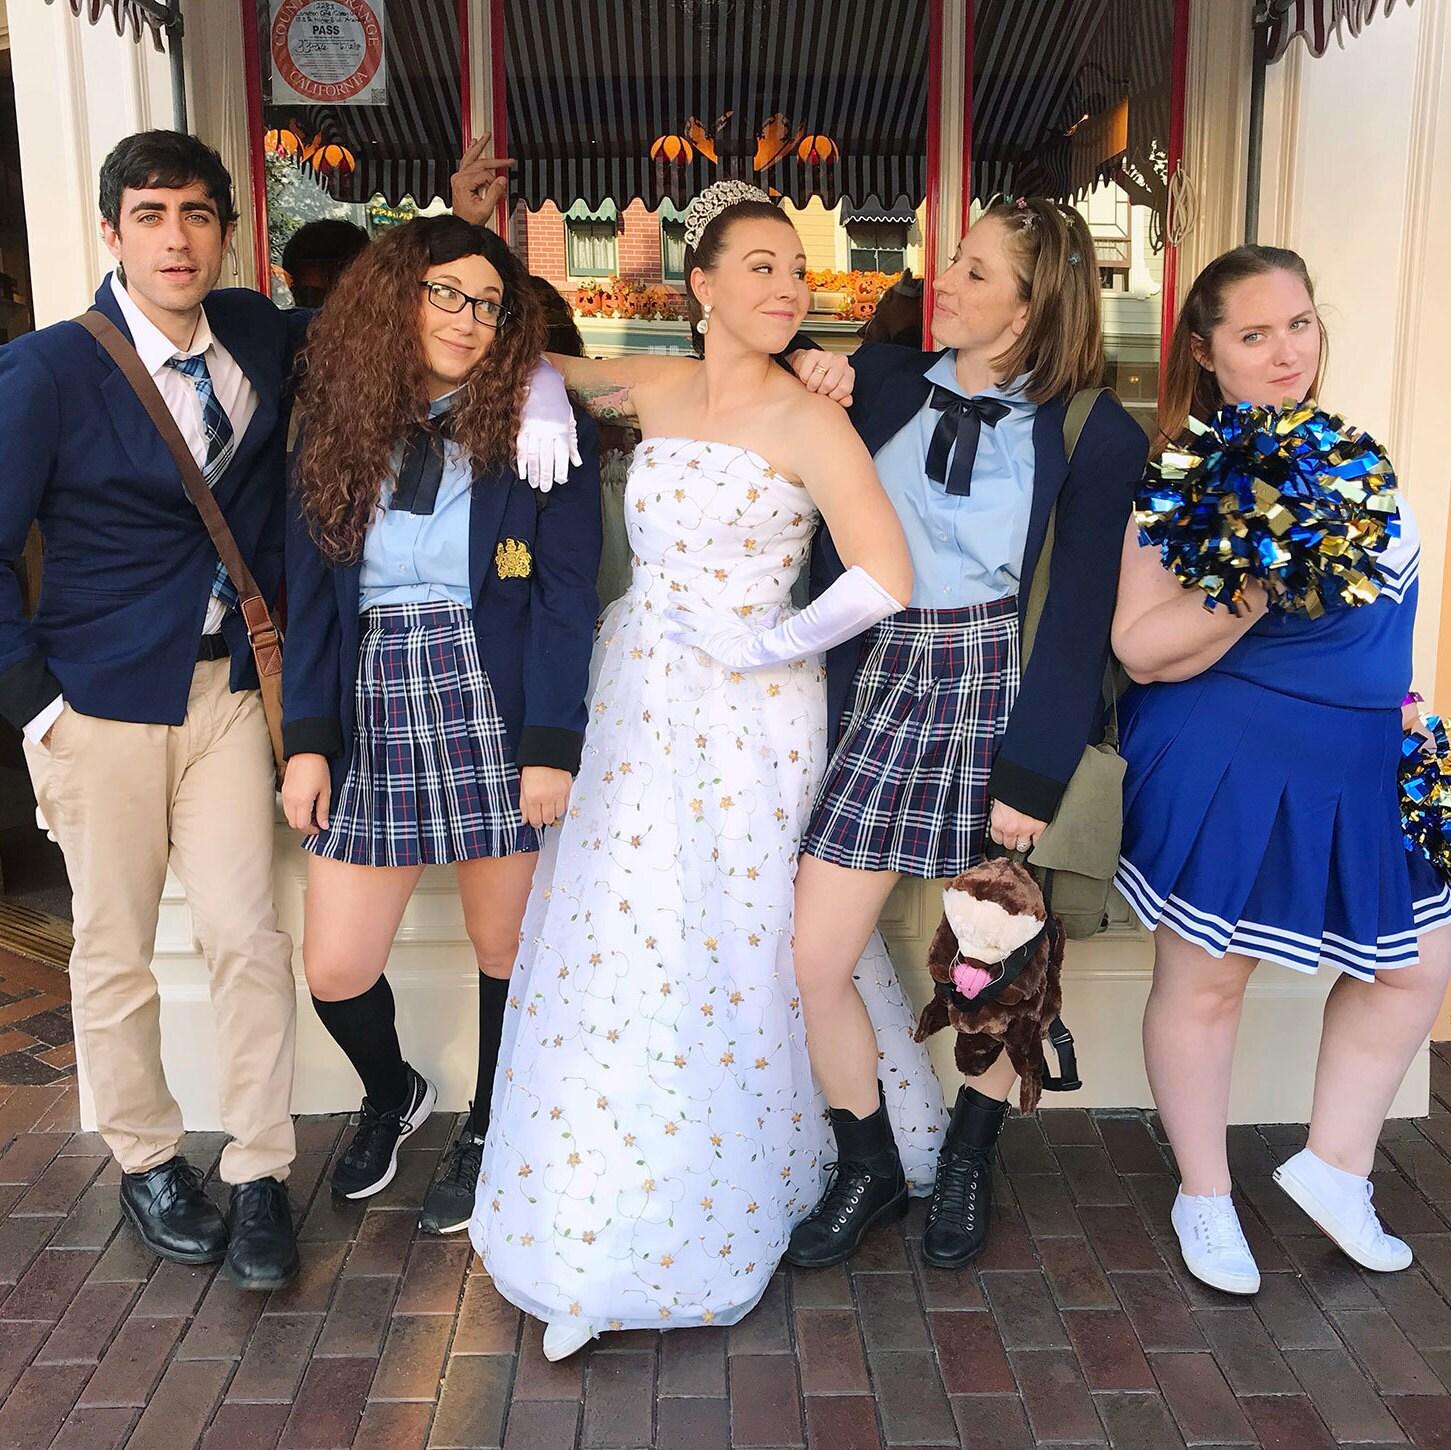 Shut Up! Shut Up! This Princess Diaries Group Halloween Costume is So Good